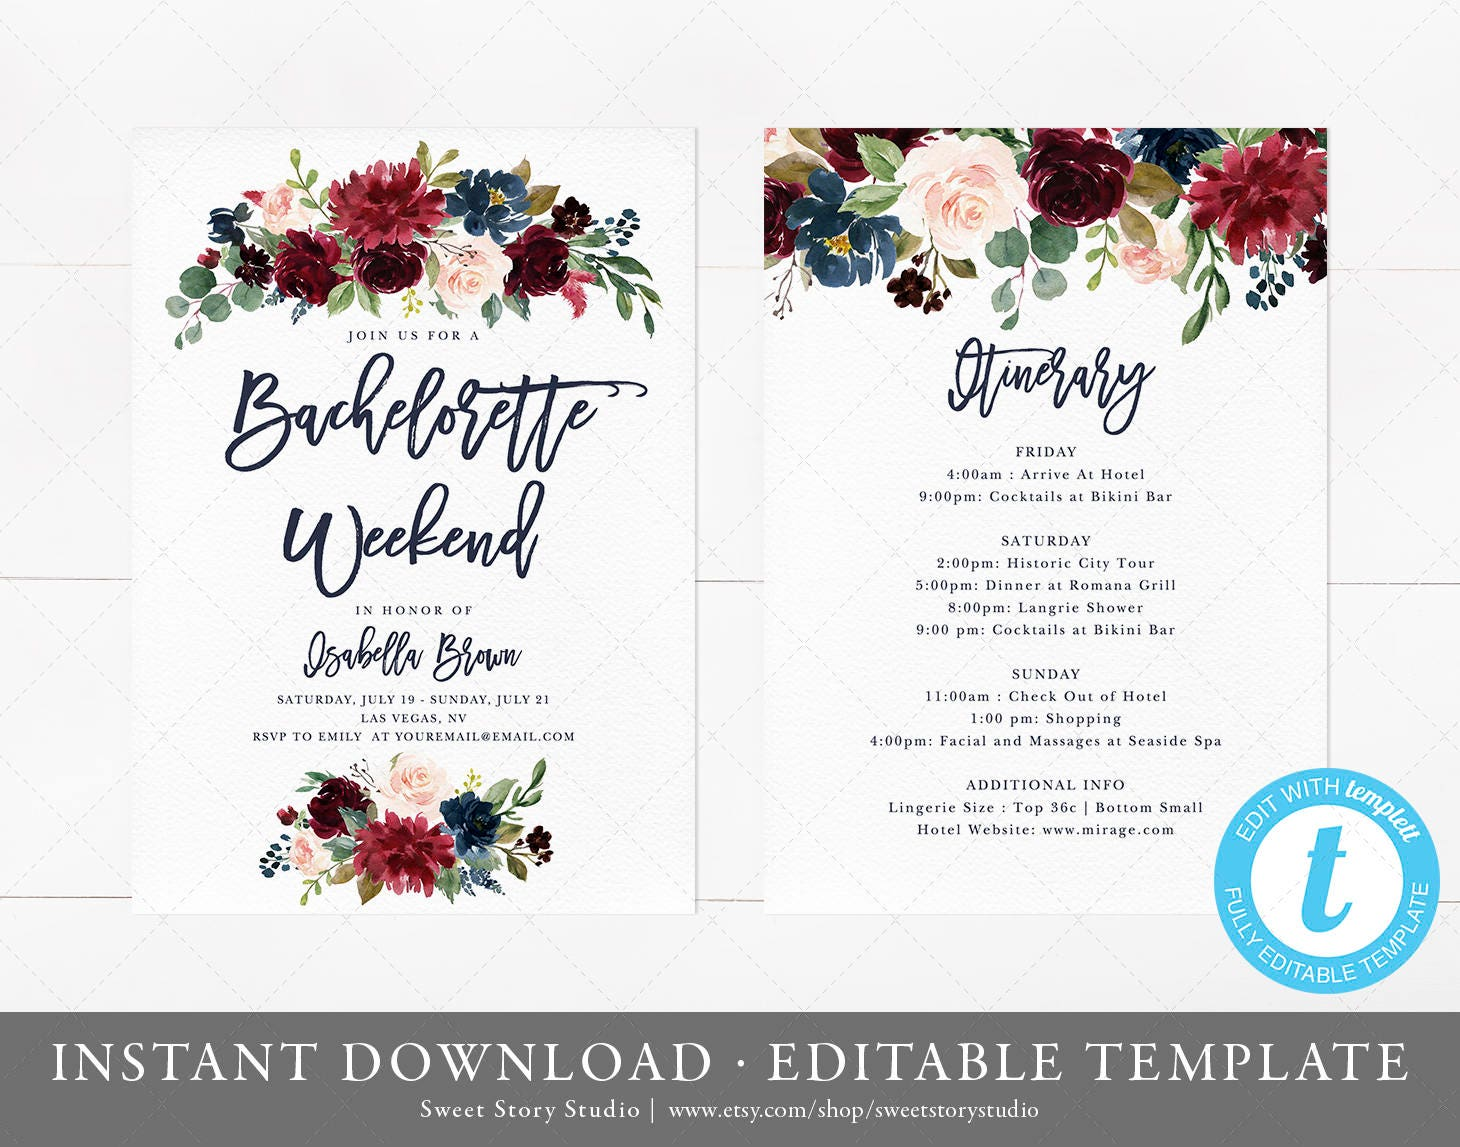 Burgundy Bachelorette Weekend Invitation and Itinerary Card